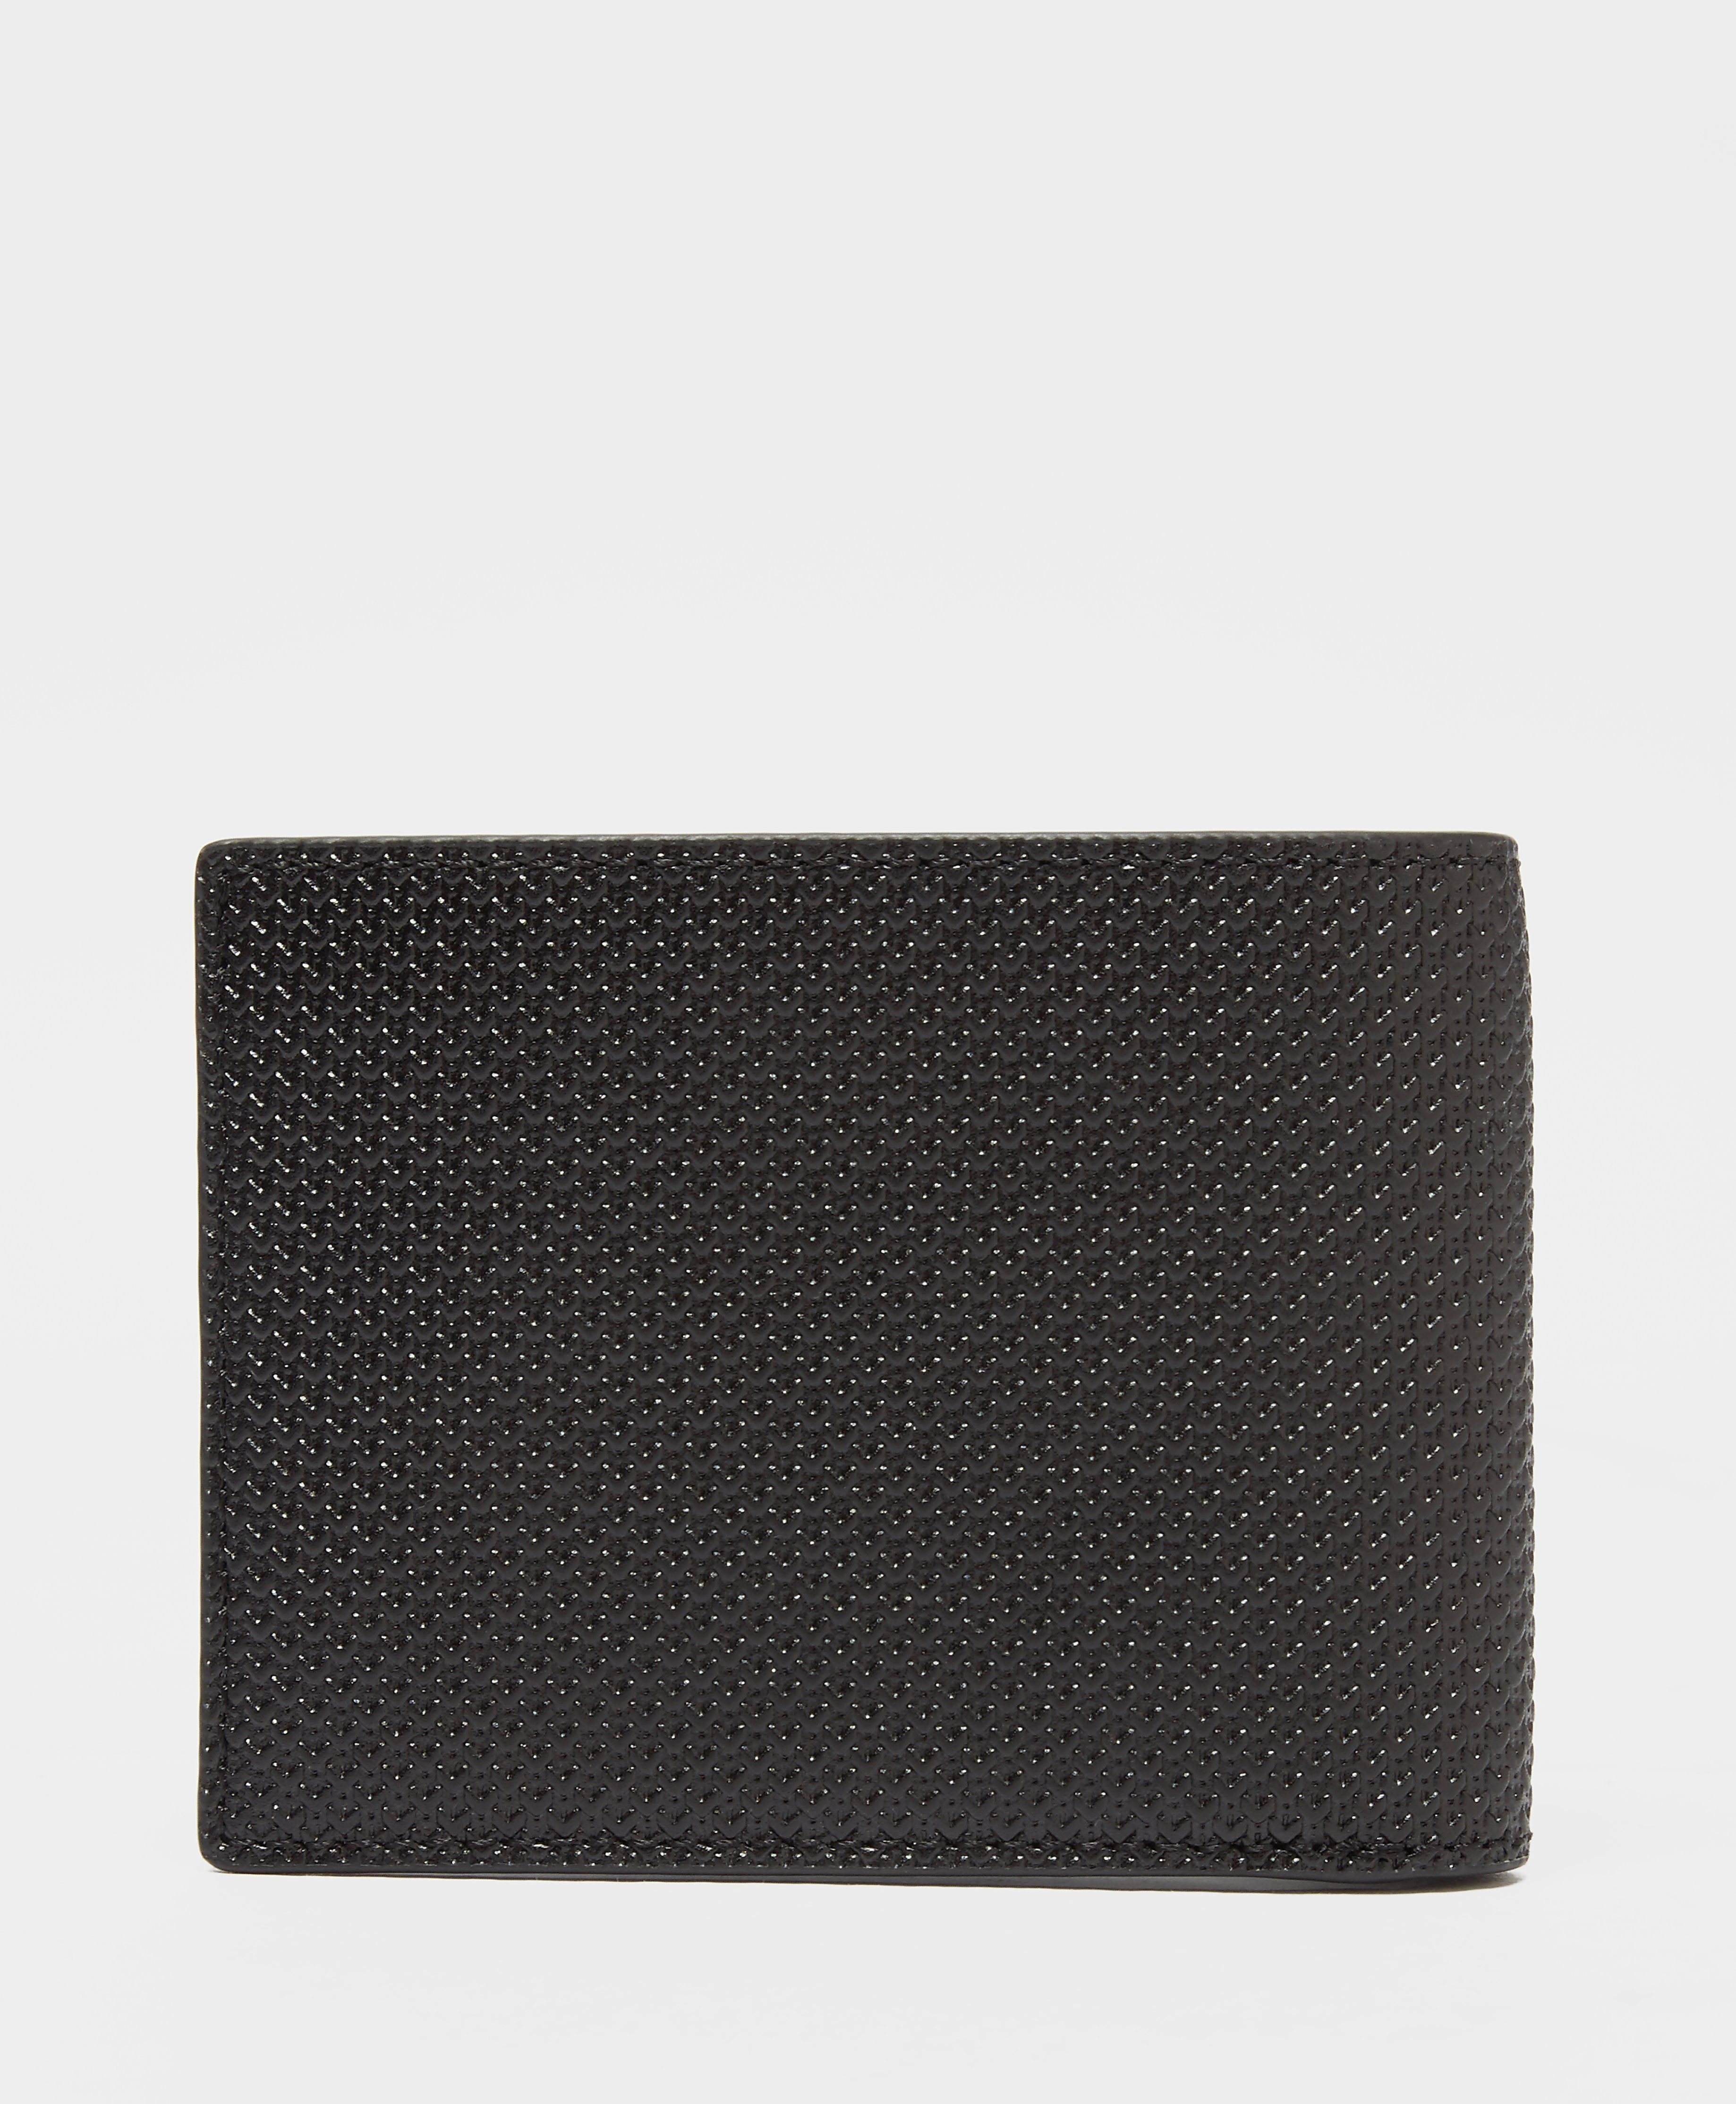 Lacoste Pique Billfold Wallet